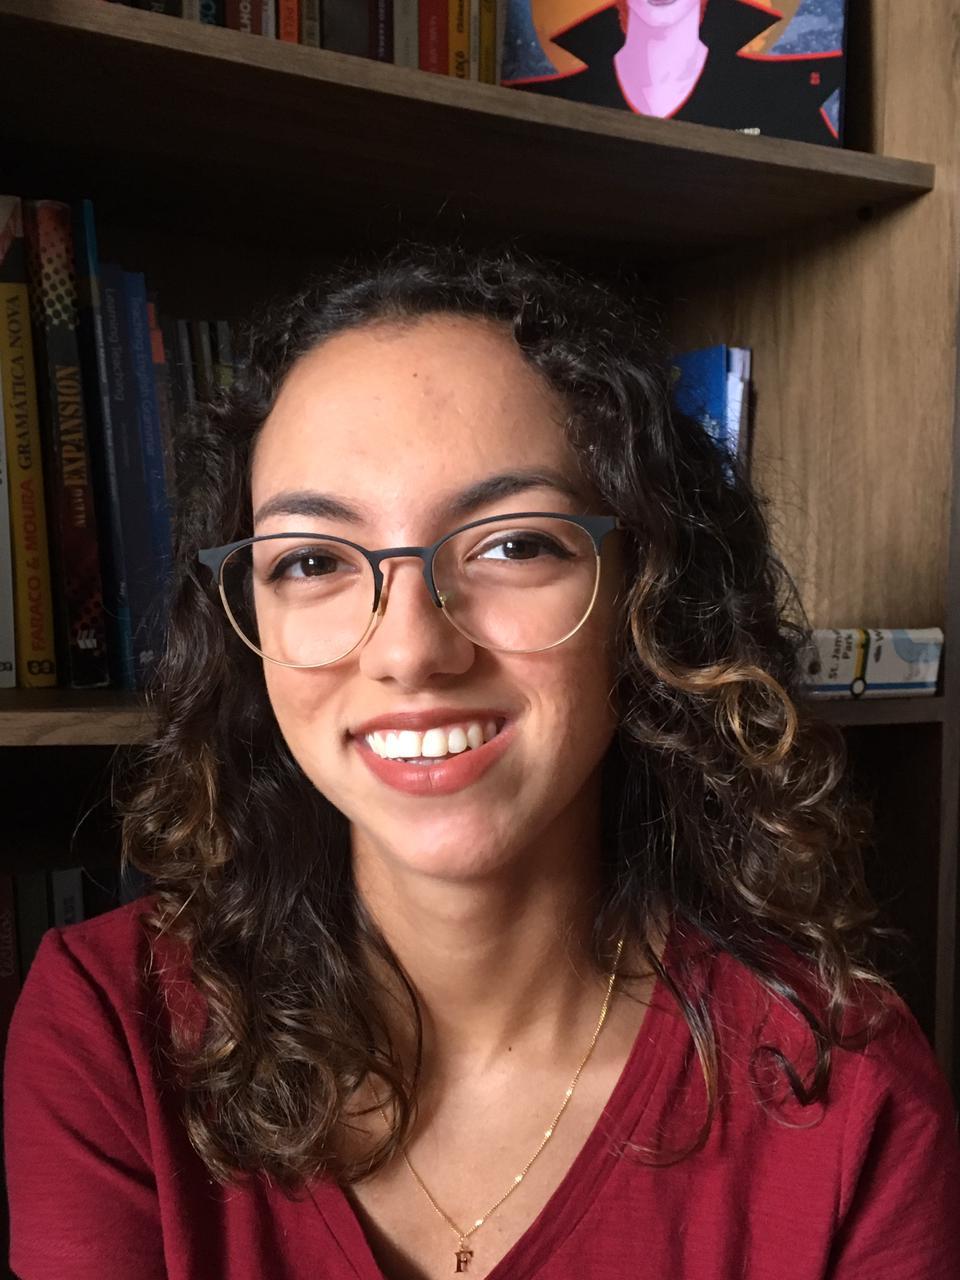 Fernanda Gonçalves Leal